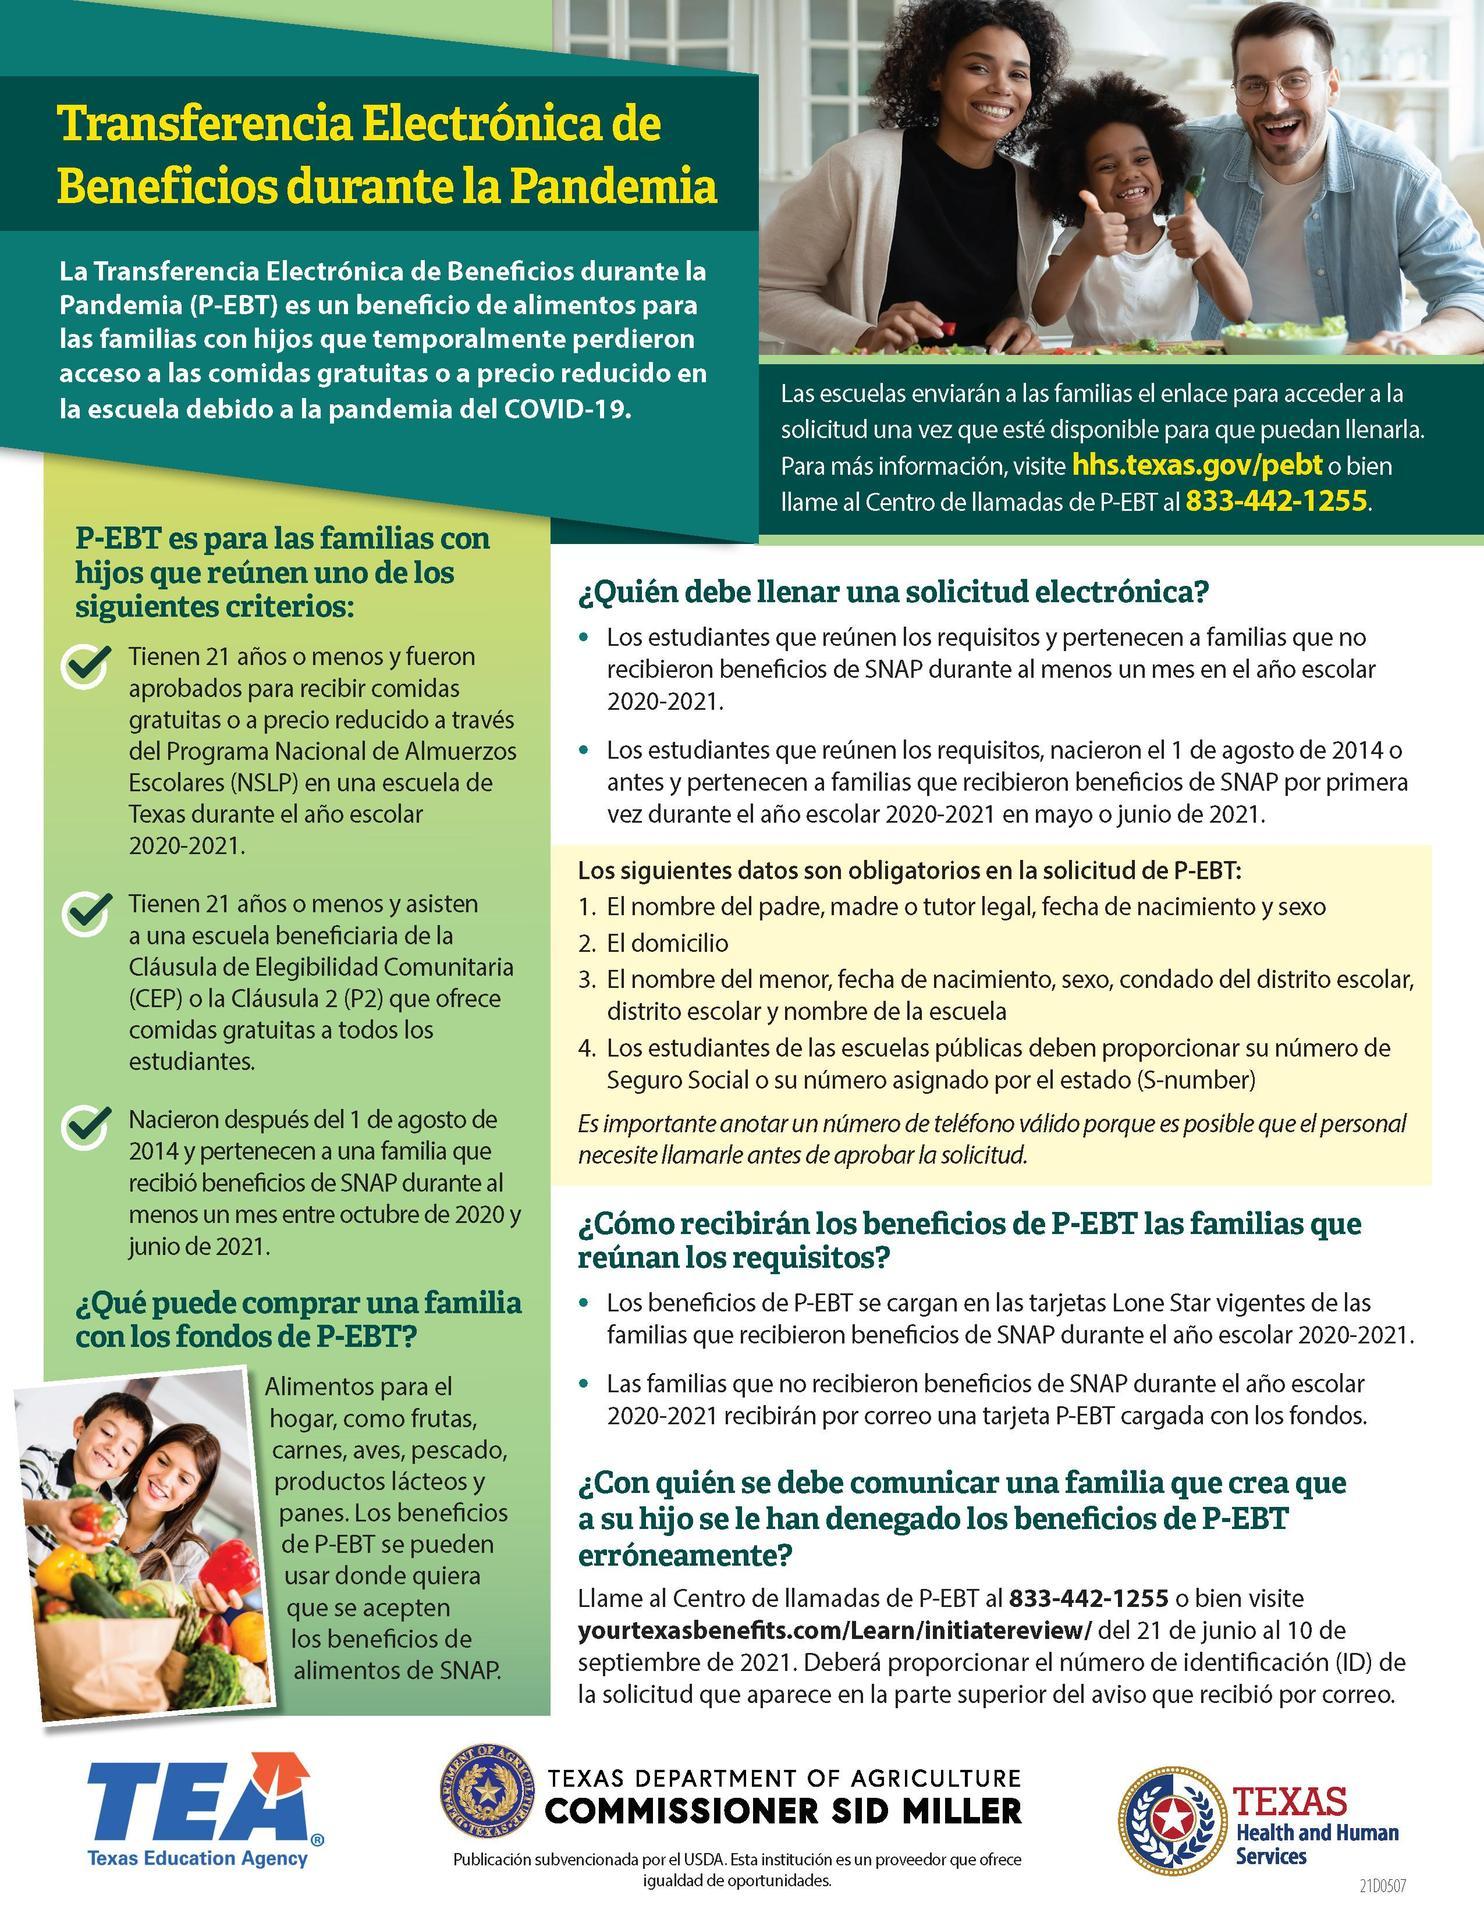 Pandemic EBT Benefits Spanish